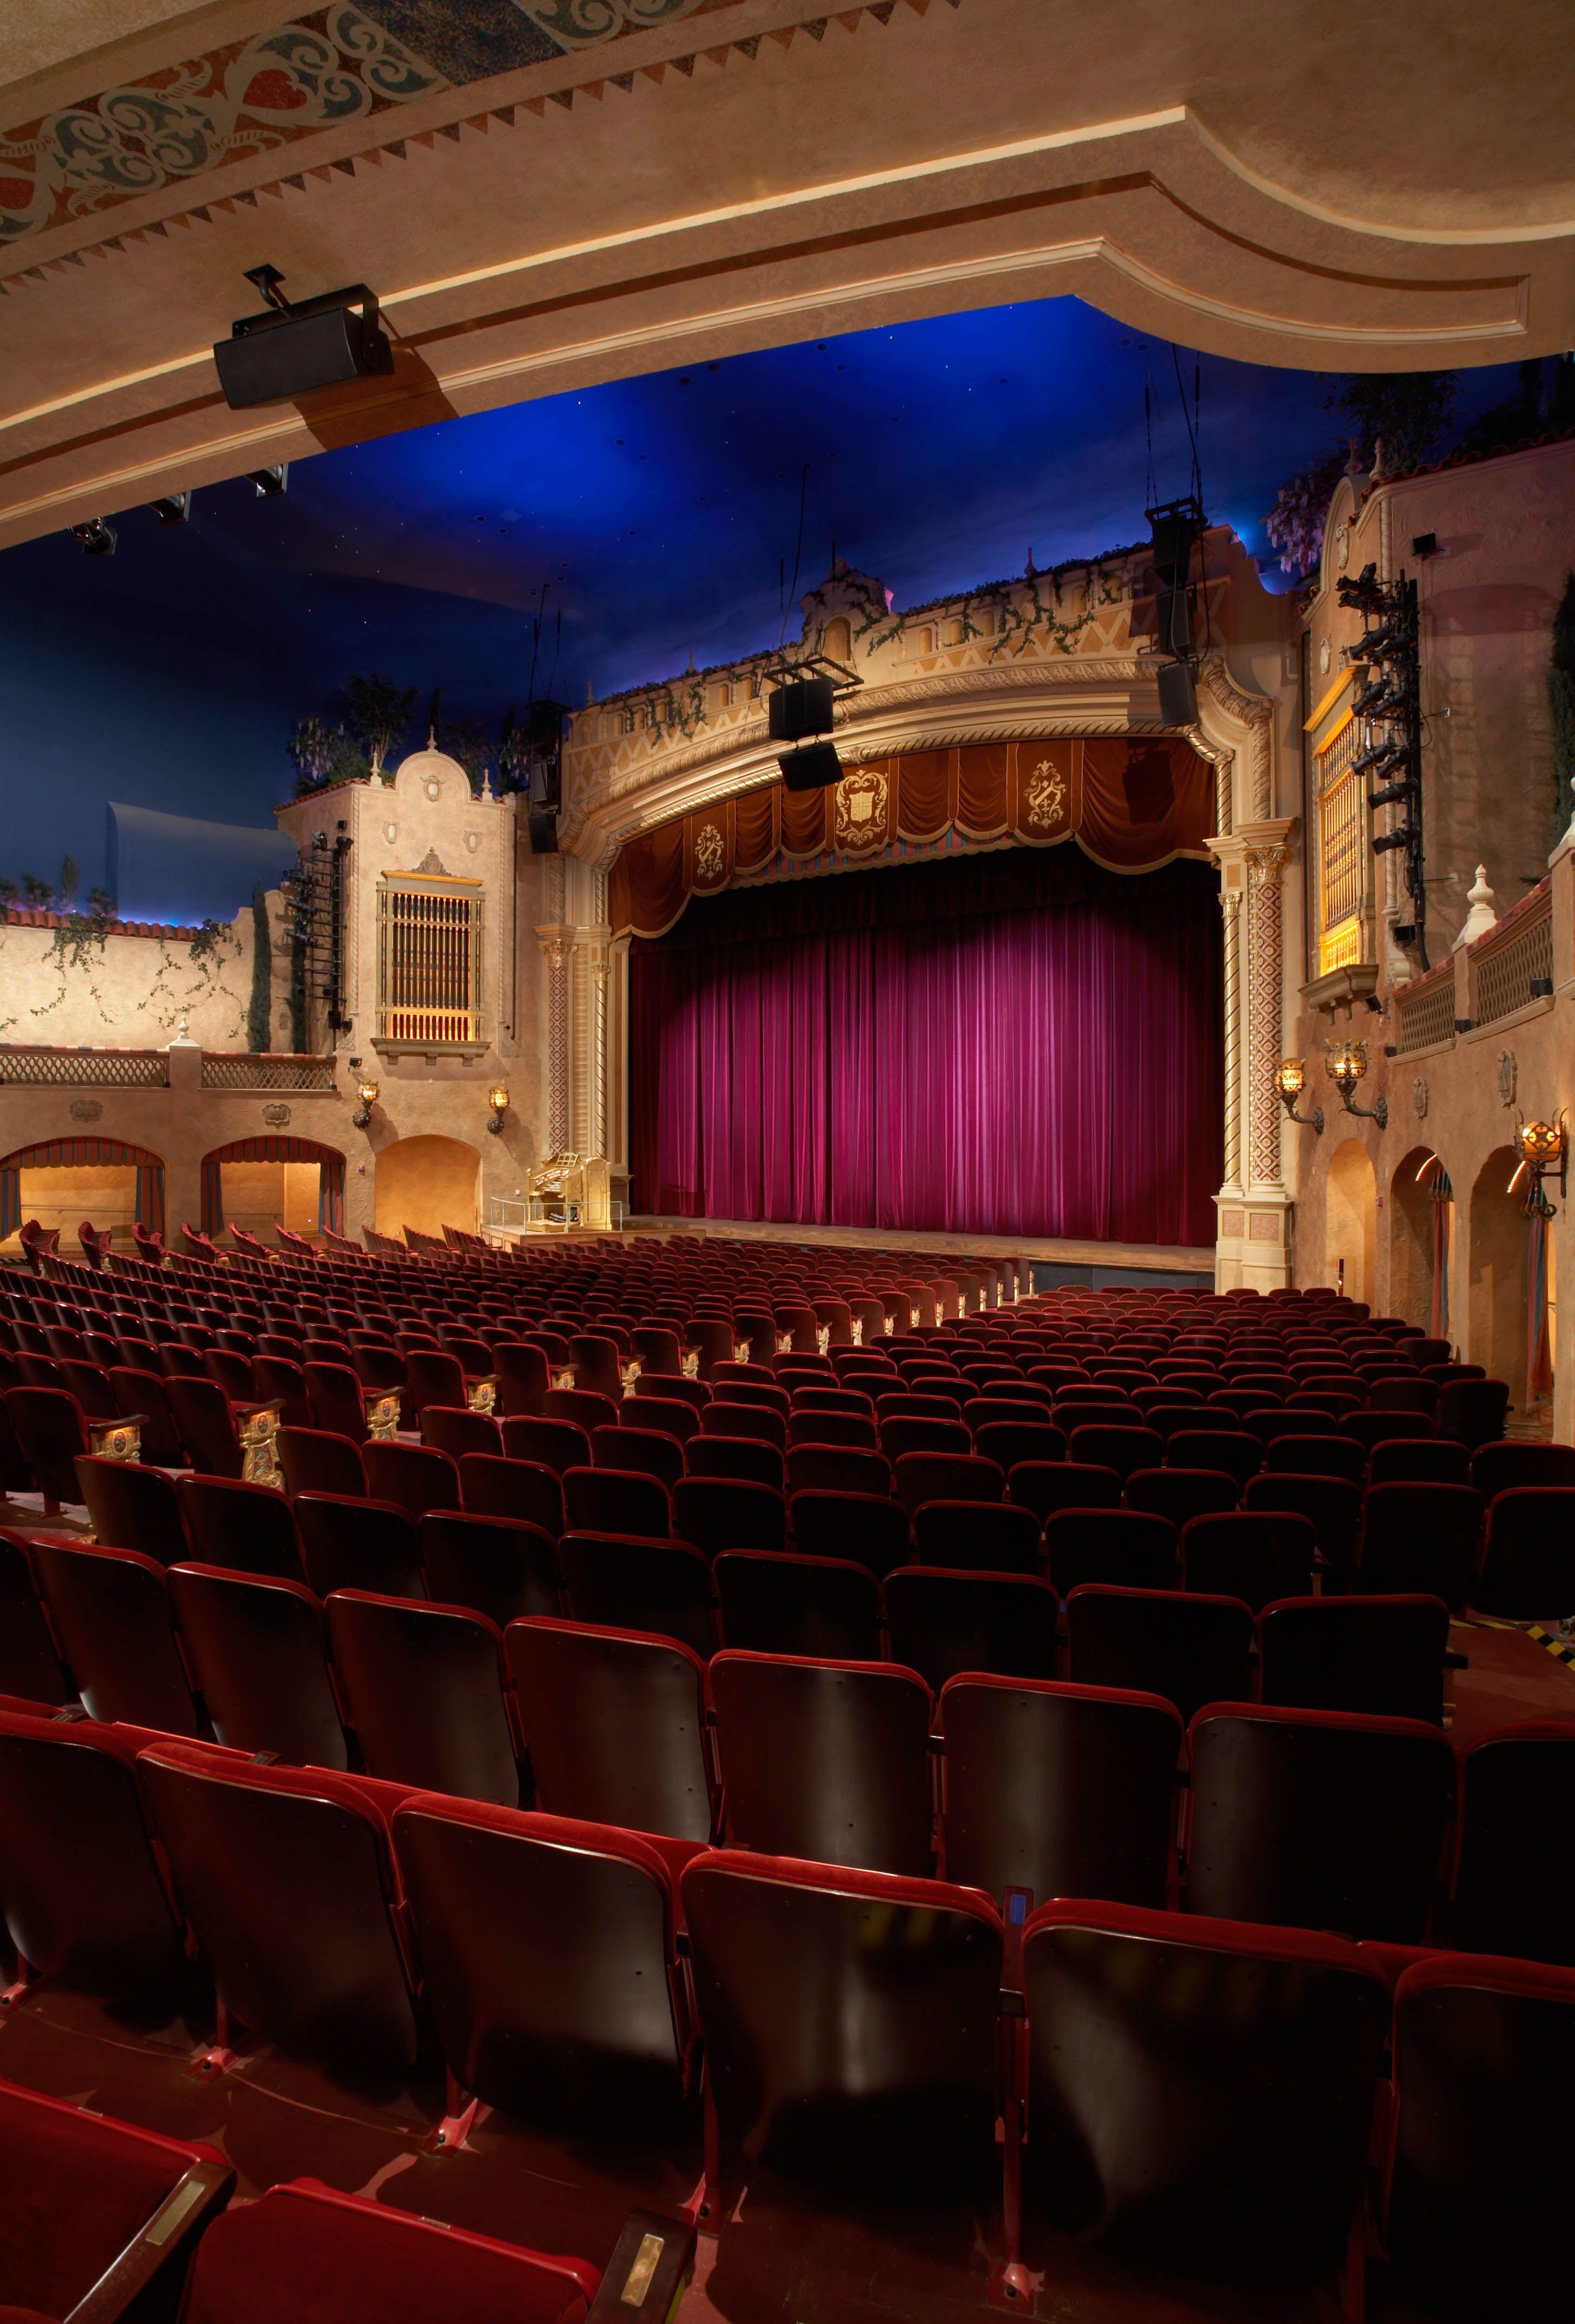 Plaza Theatre Performing Arts Center El Paso Tx Performance Art Performing Arts Center Historic Theater